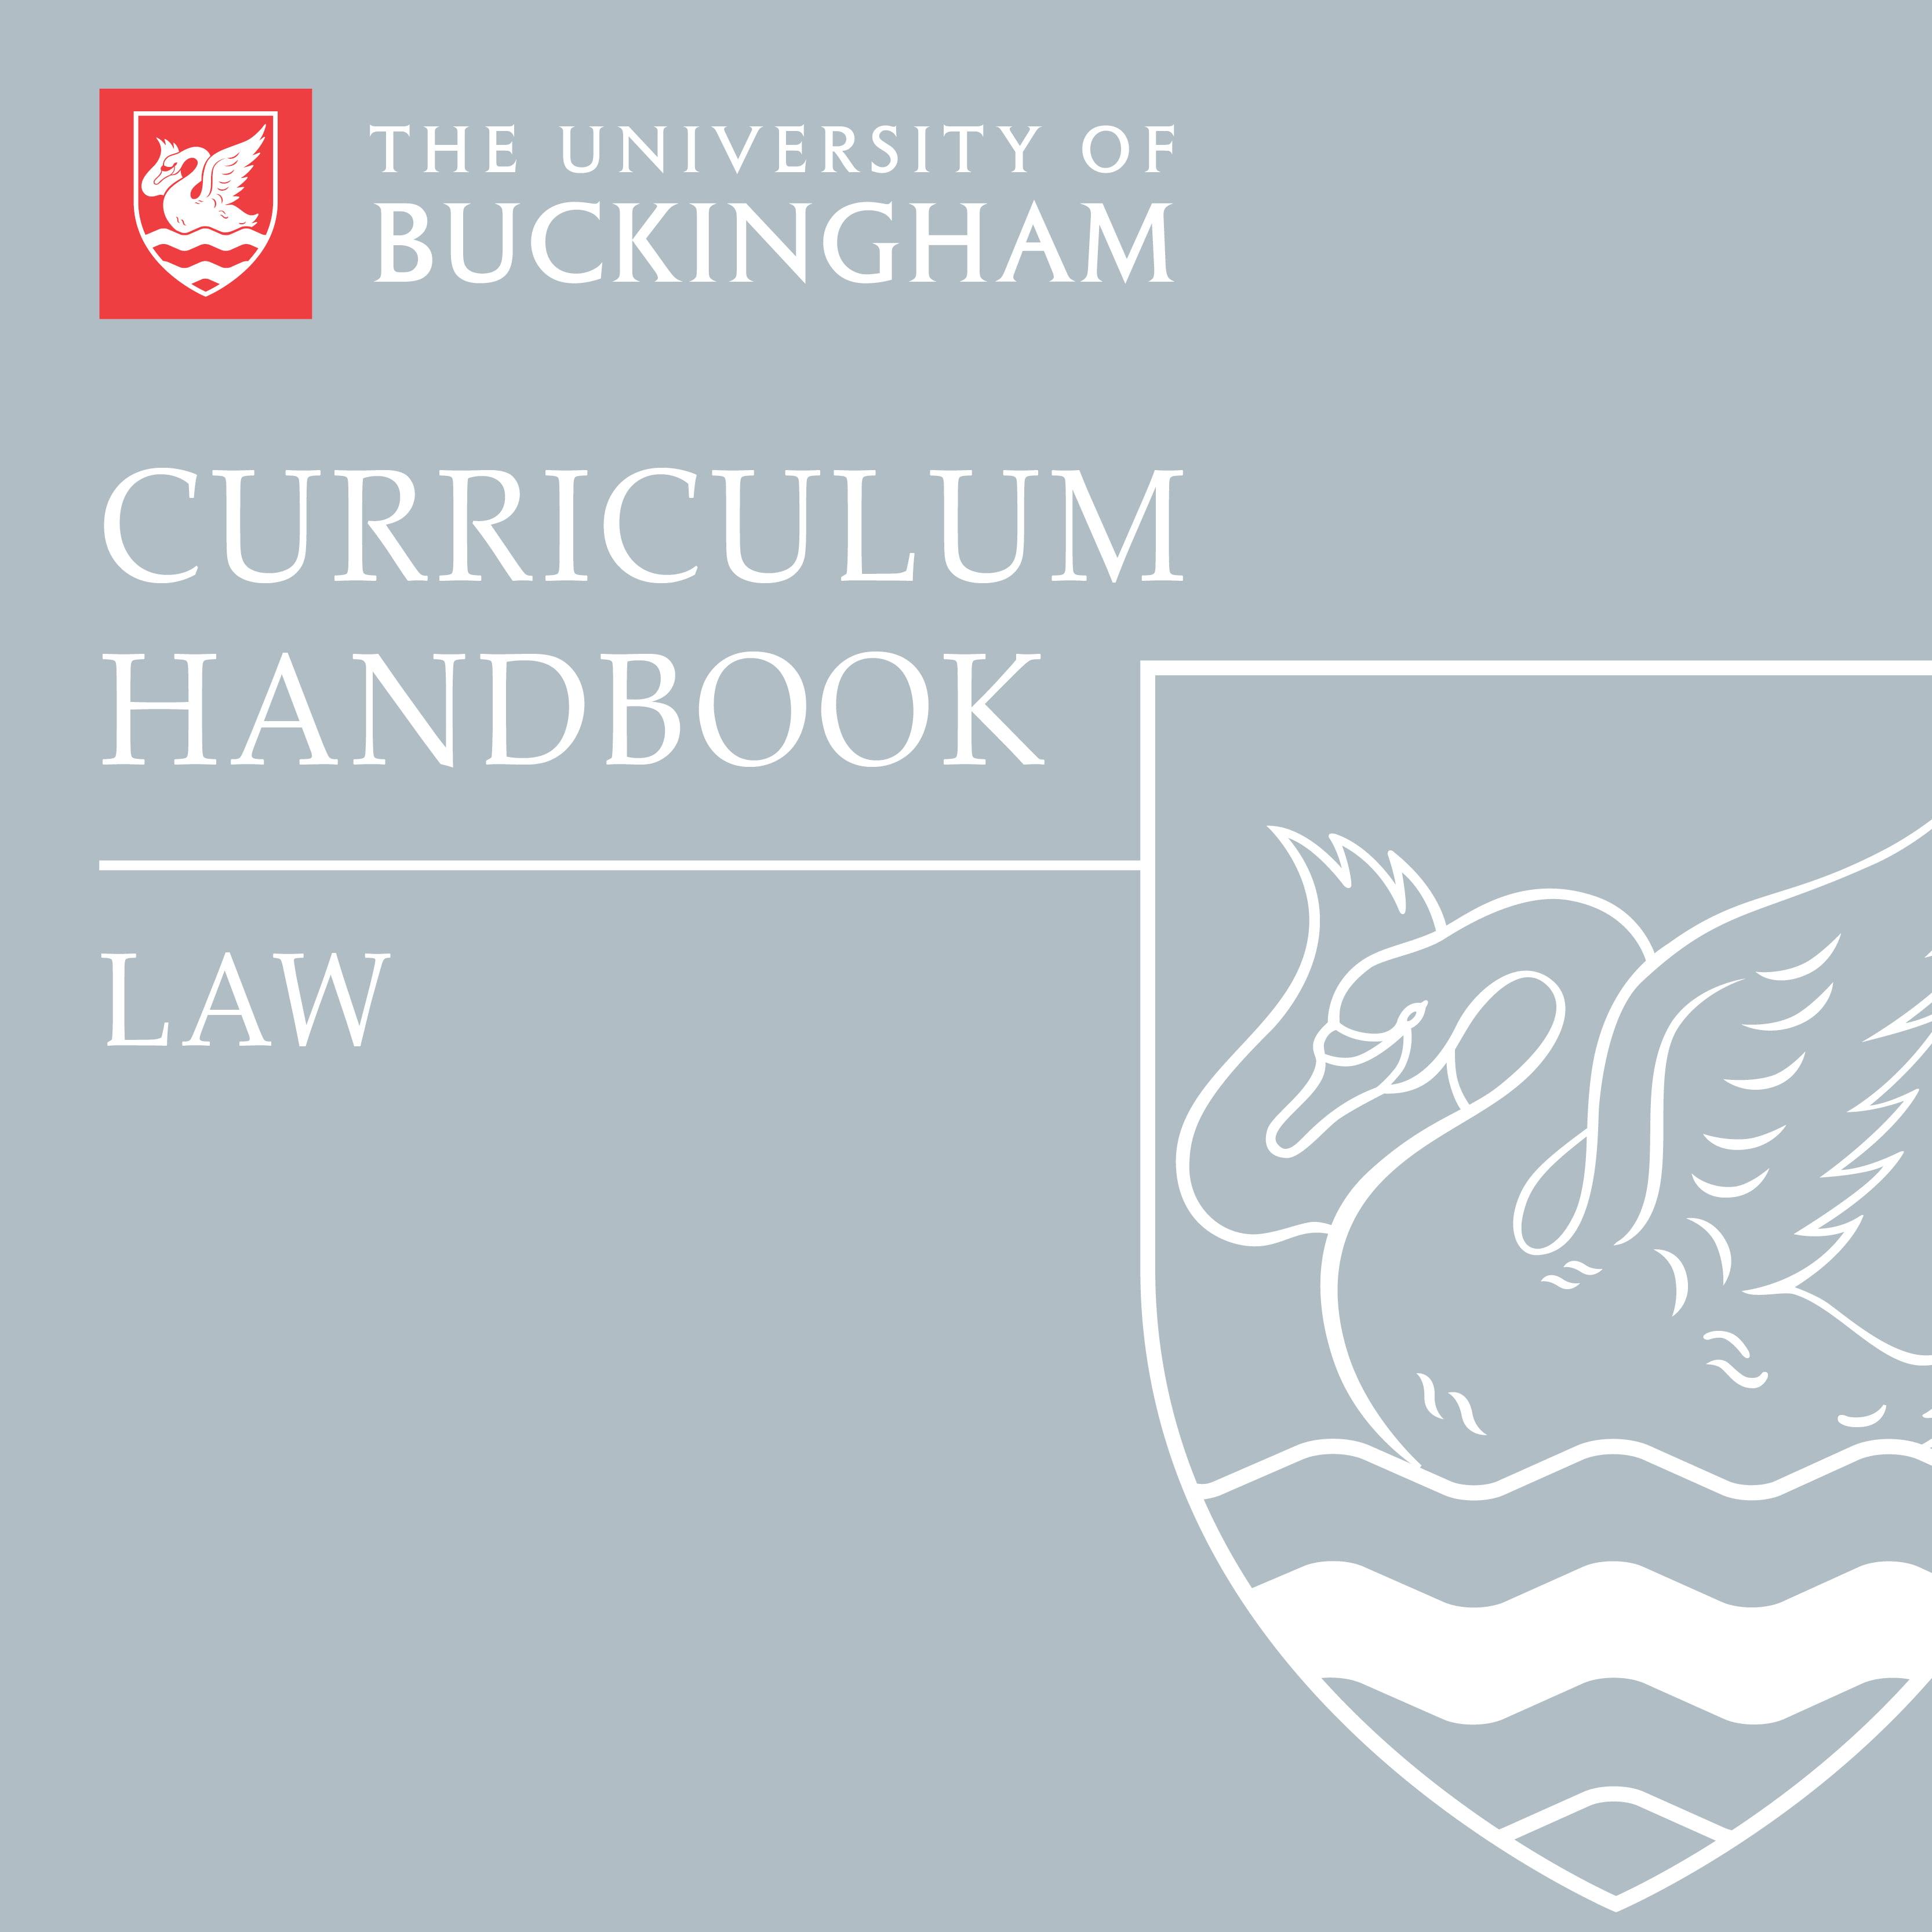 Curriculum Handbook - Law - front cover - online